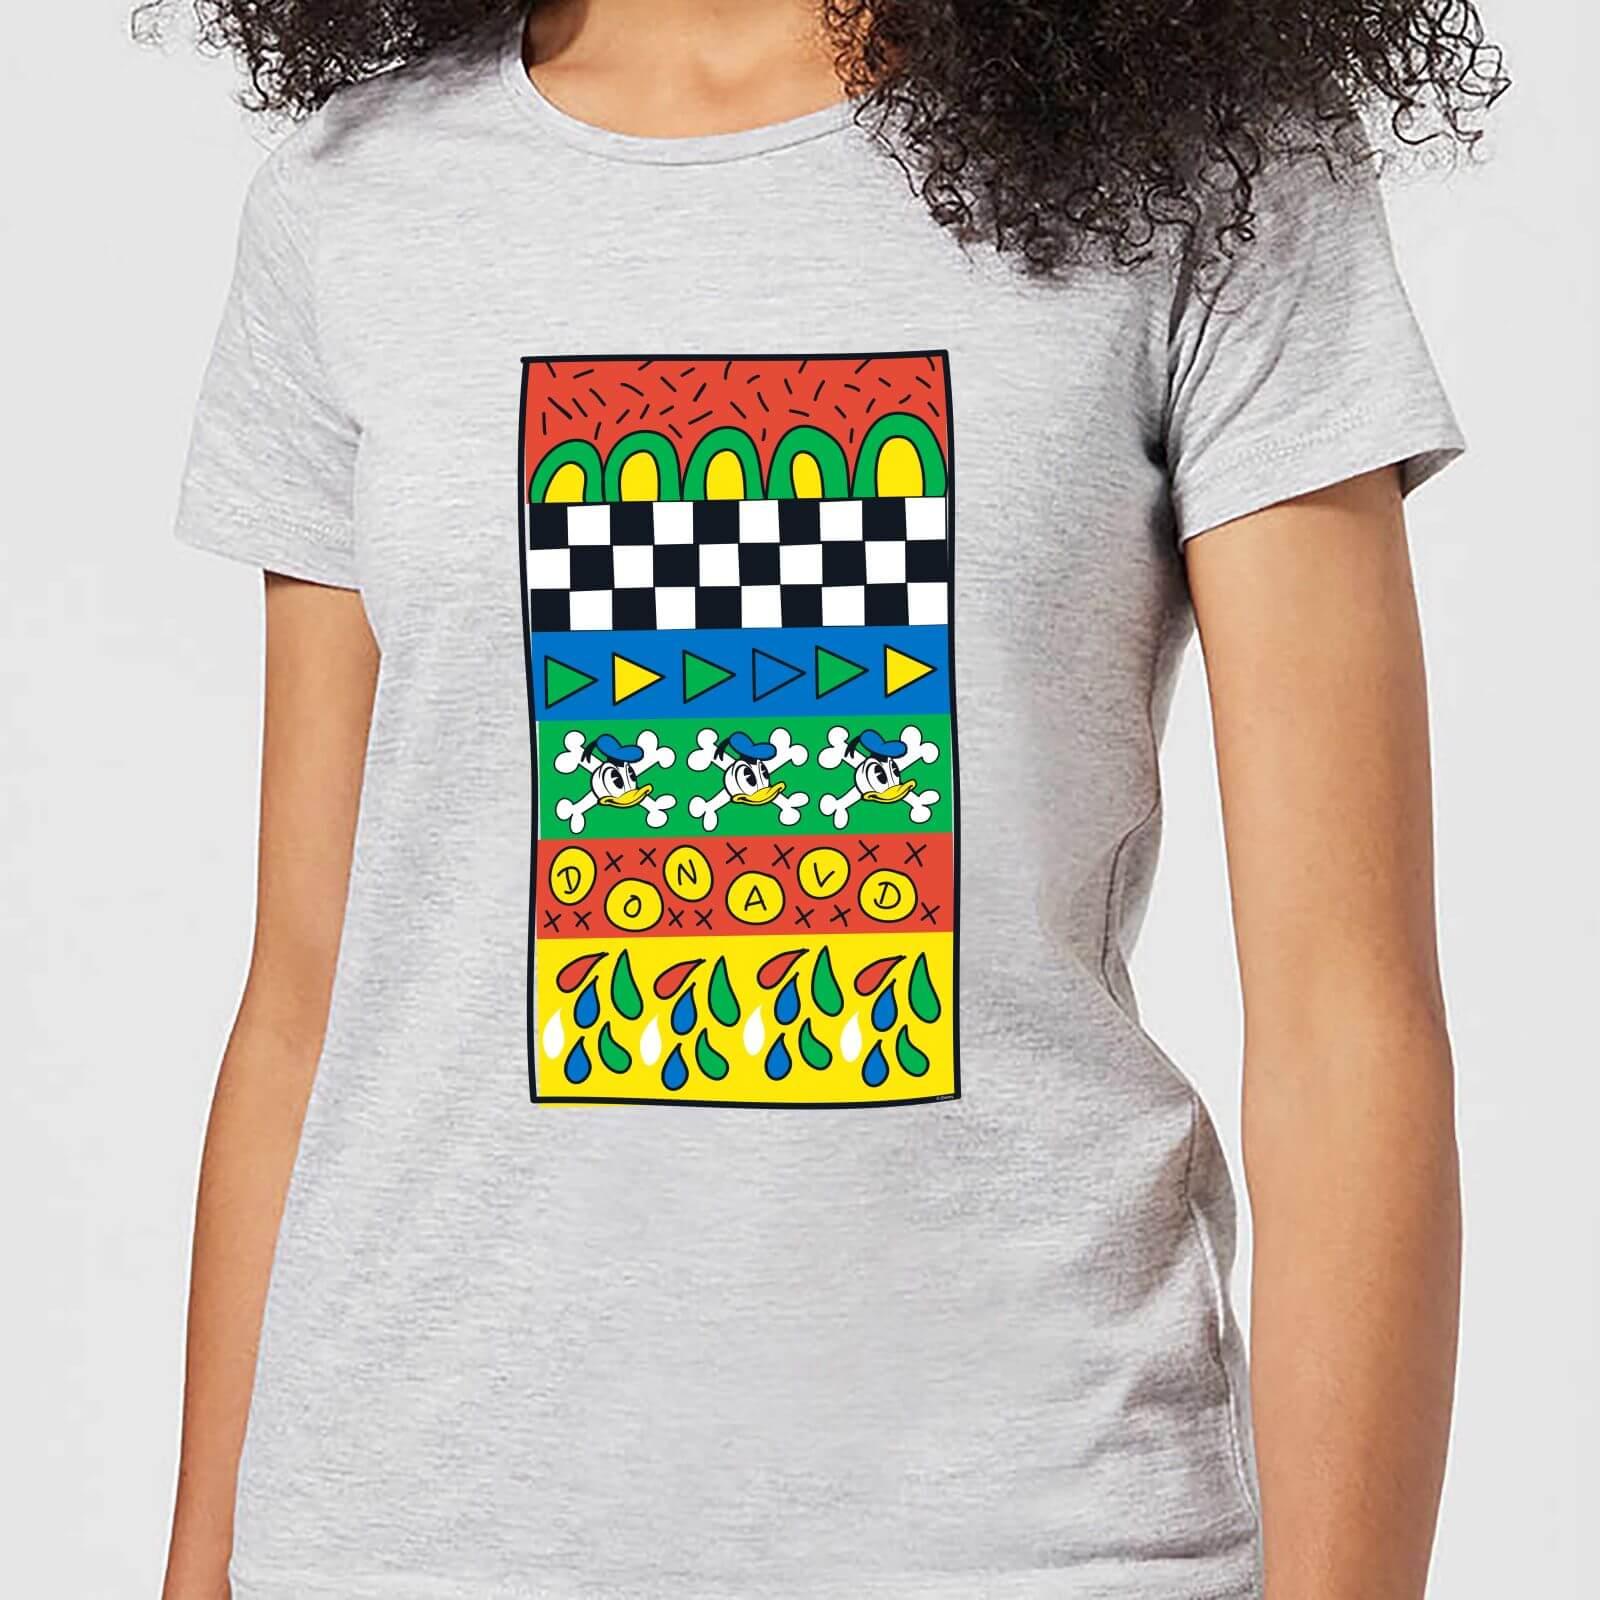 Disney Donald Duck Vintage Pattern Women's T-Shirt - Grey - 4XL - Grey